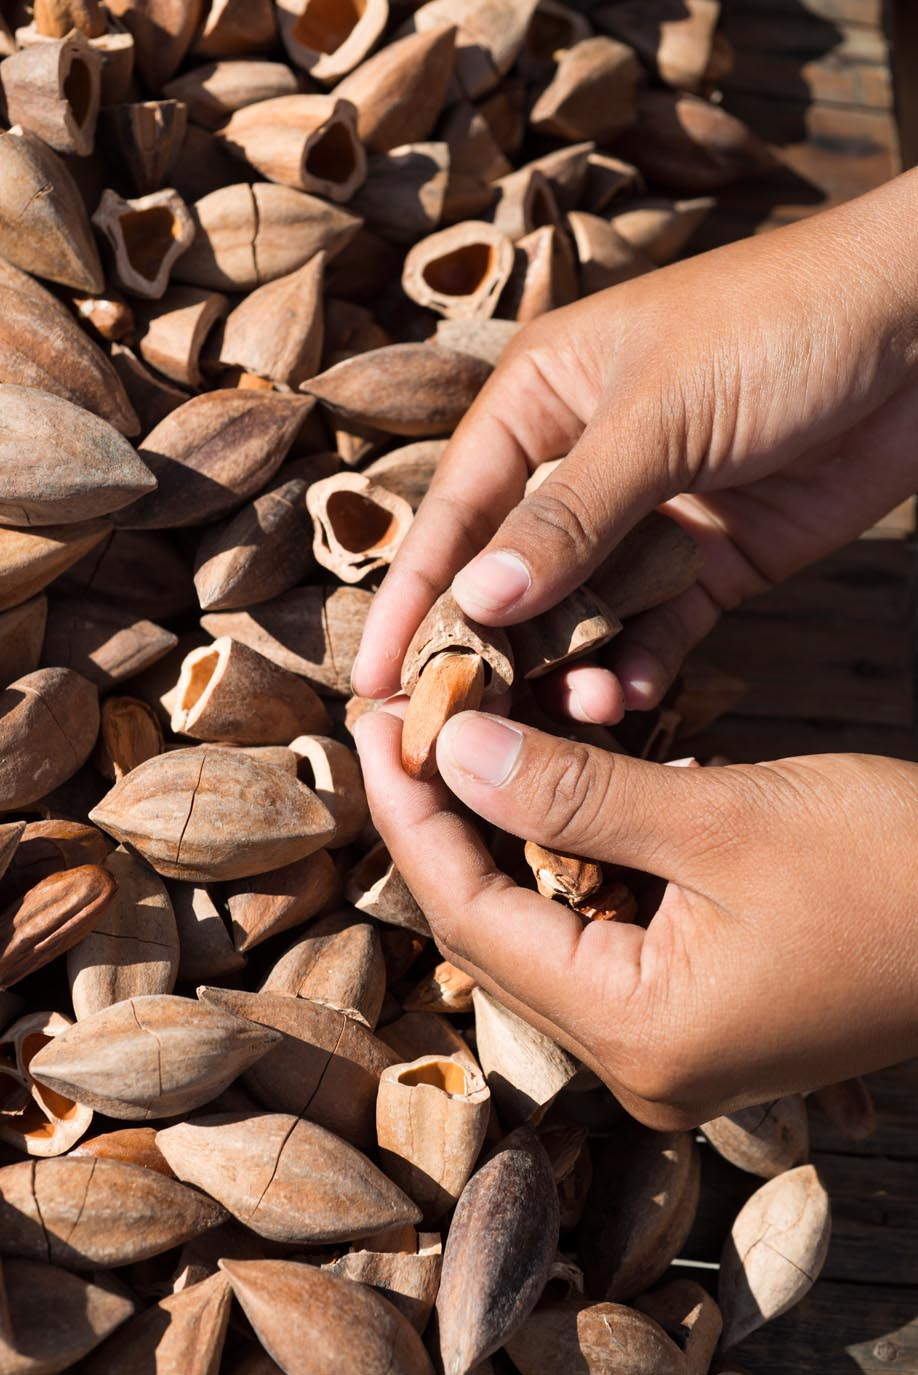 Cracked Pili Nuts